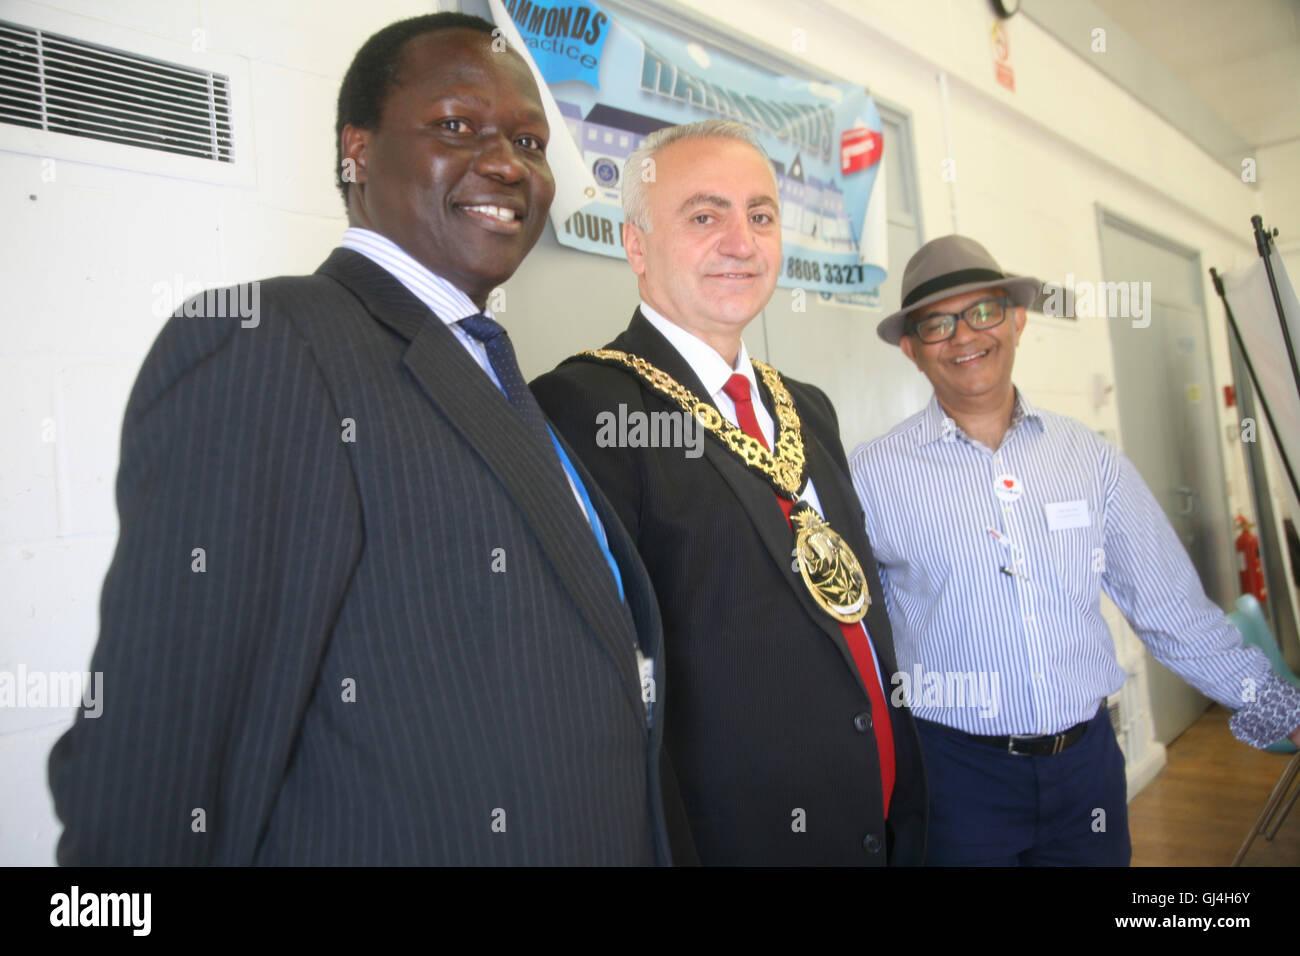 Community Impact Haringey, Chestnuts Community Centre,  Mayor of Haringey,  Ozbek, with councillors . - Stock Image